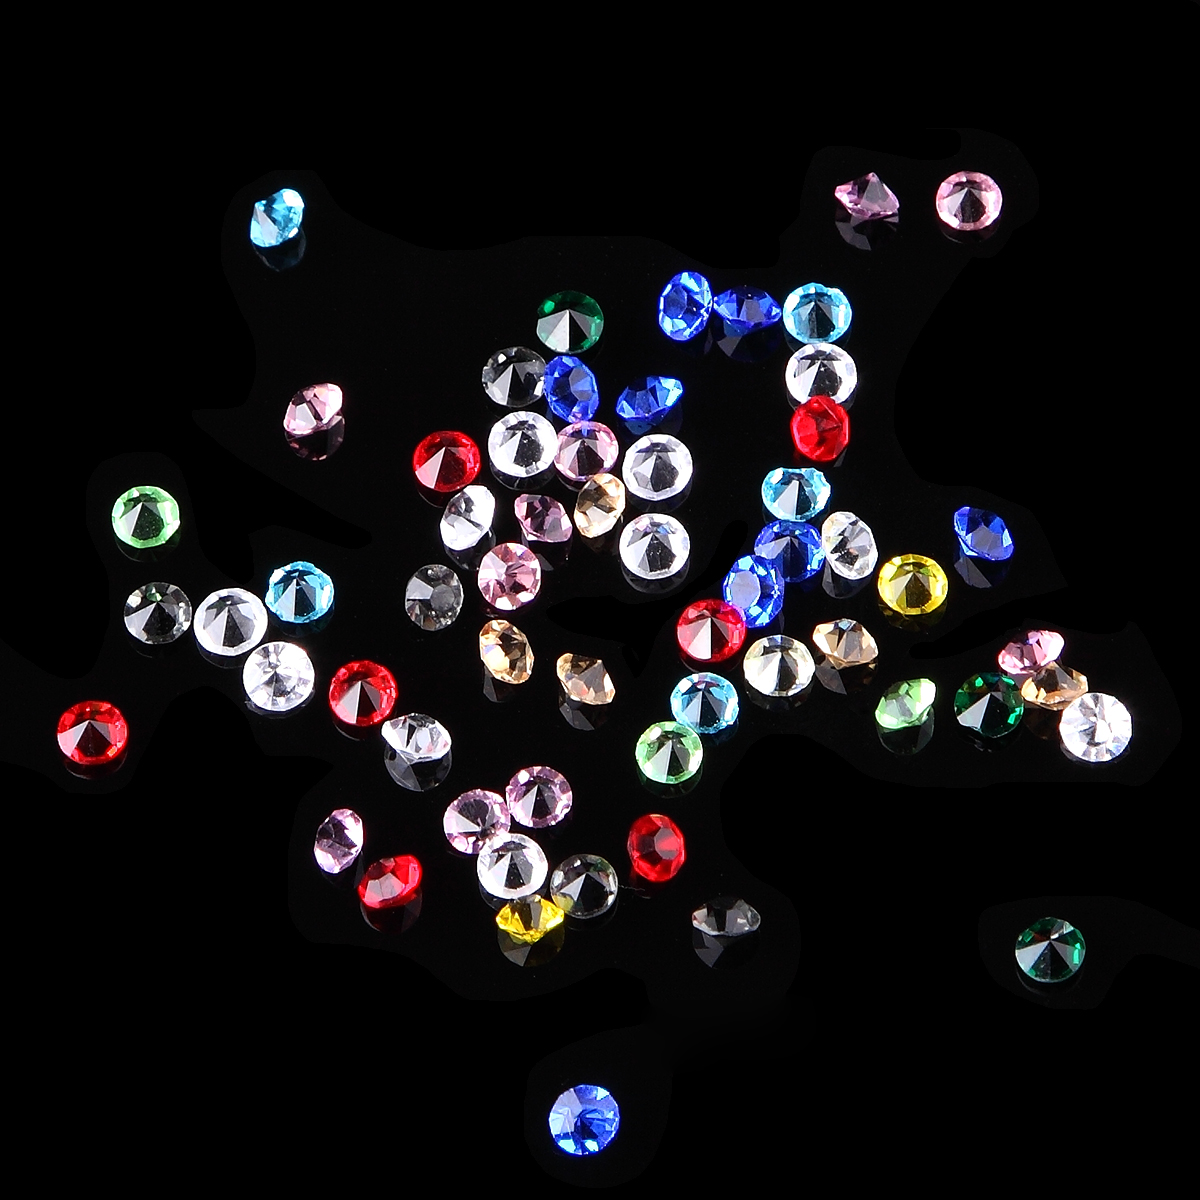 4mm Colorful Nail Art Glitter Glass Crystal Rhinestone Cone Bottom Decor Studs Acrylic Gel Polish 3D DIY Charm Jewelry Accessory  diy 20pcs bag nail art decoration 3d gel polish beautifully oval stone charm diamond acrylic resin nail art accessorietips